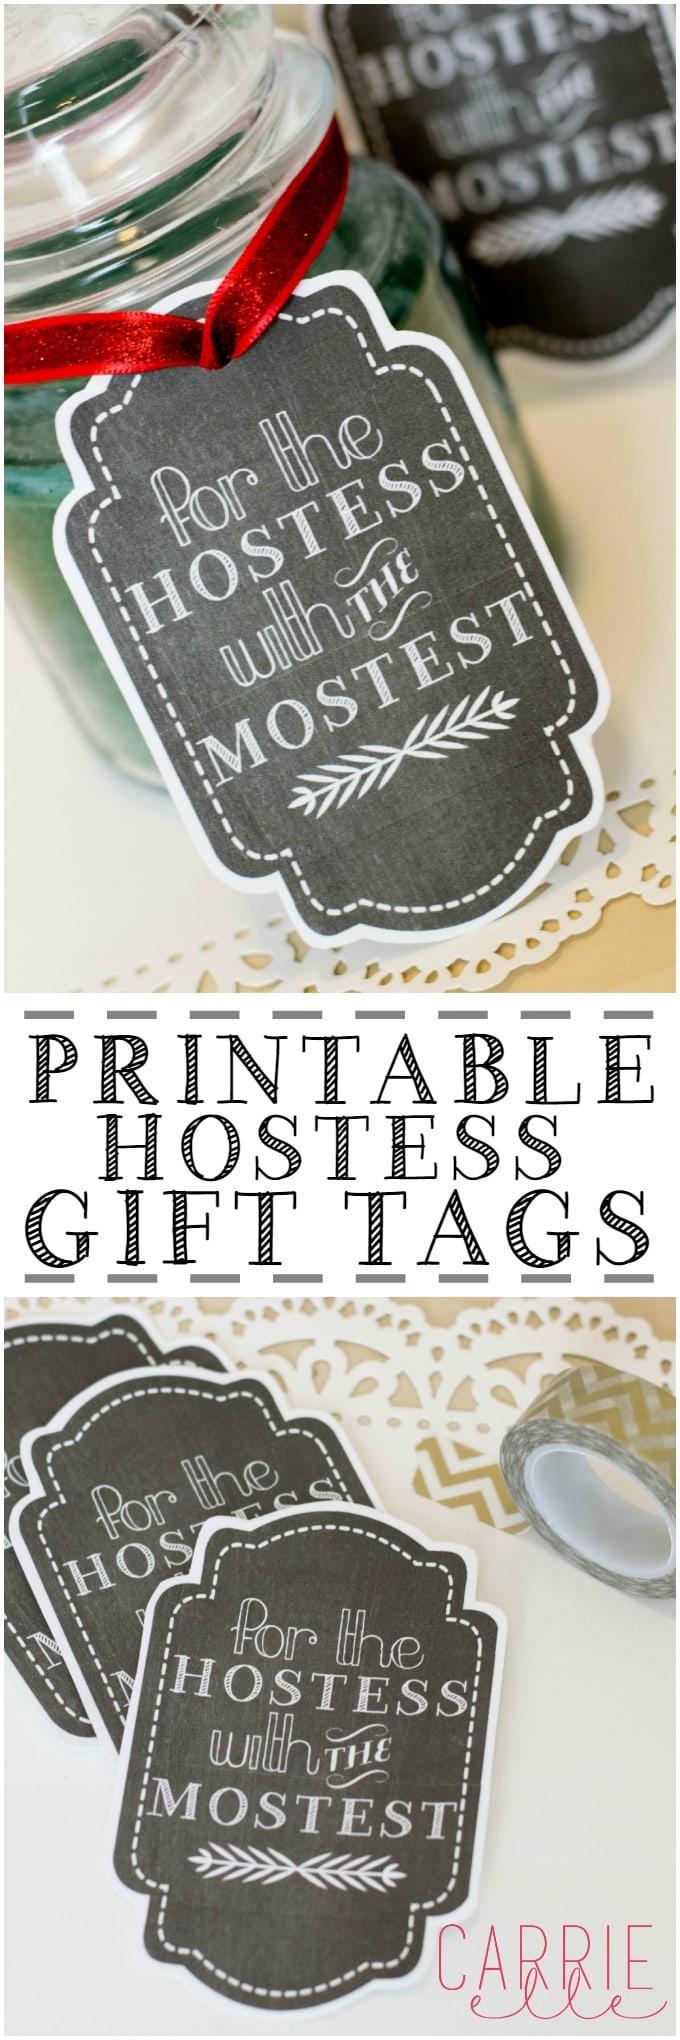 Free Printable Gift Tags: Hostess Gift Tag